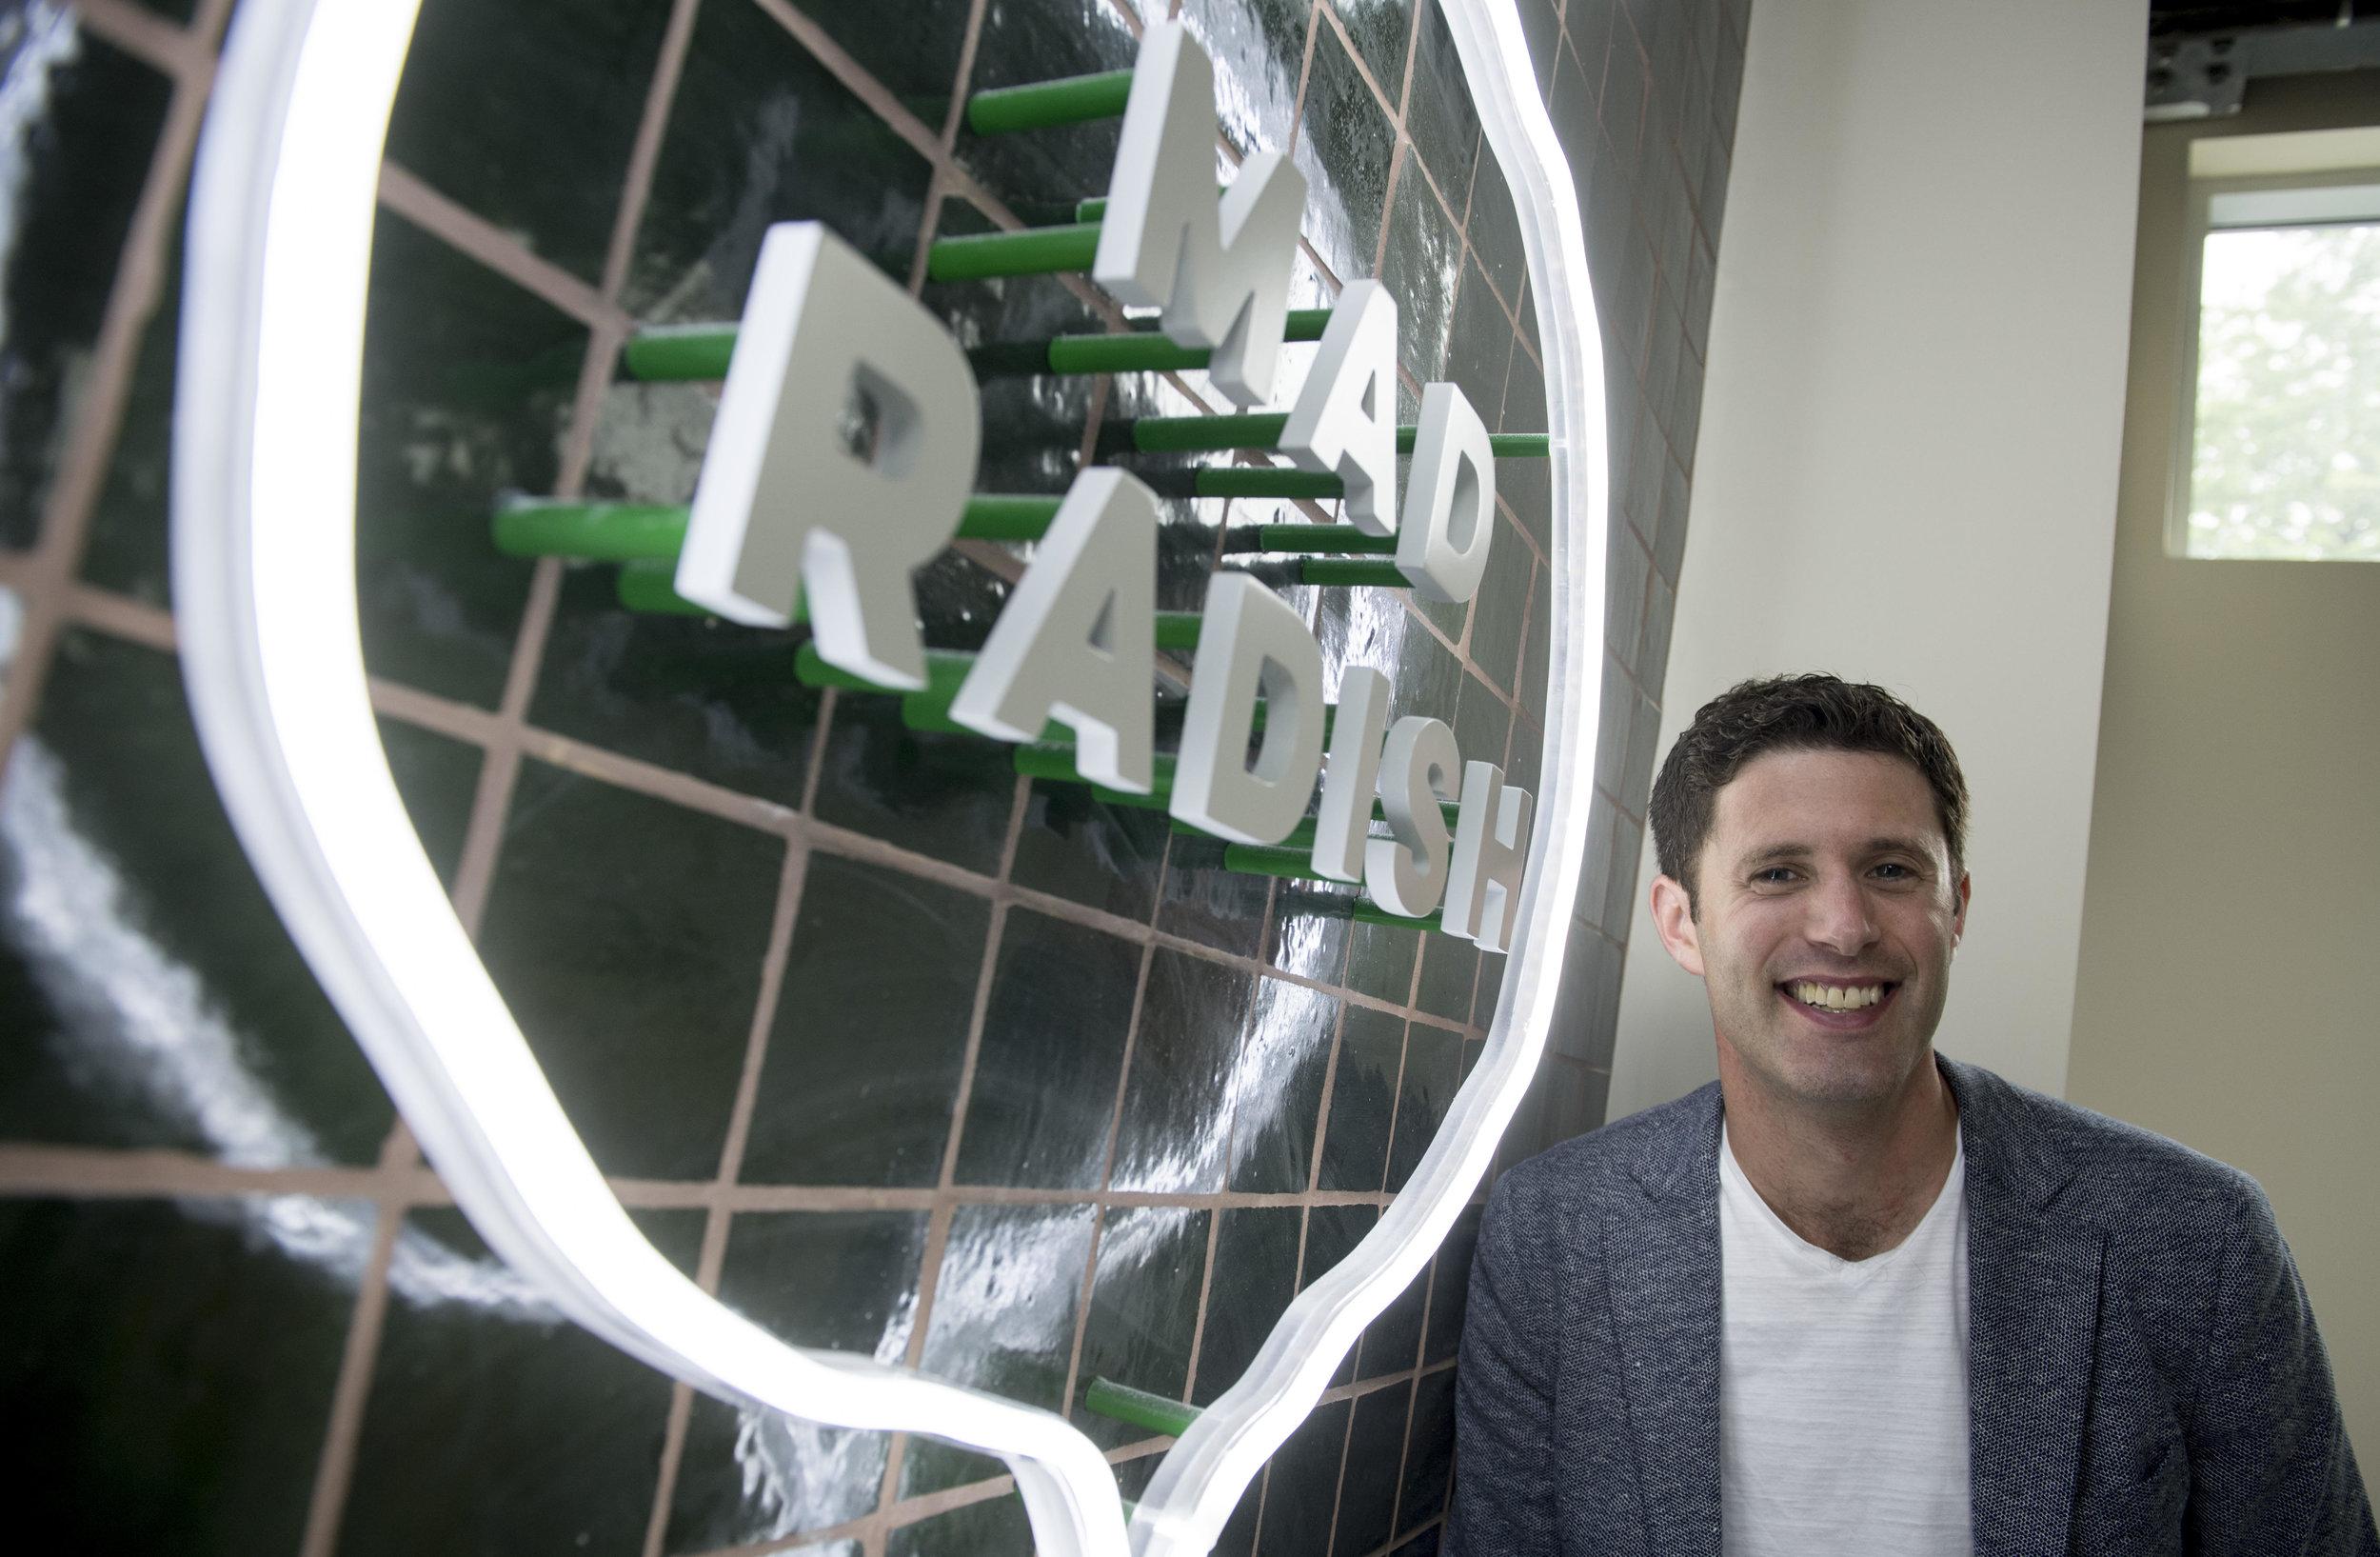 <strong> David Segal </strong> <br> Founder, Mad Radish <br> Co-Founder, DAVIDsTEA